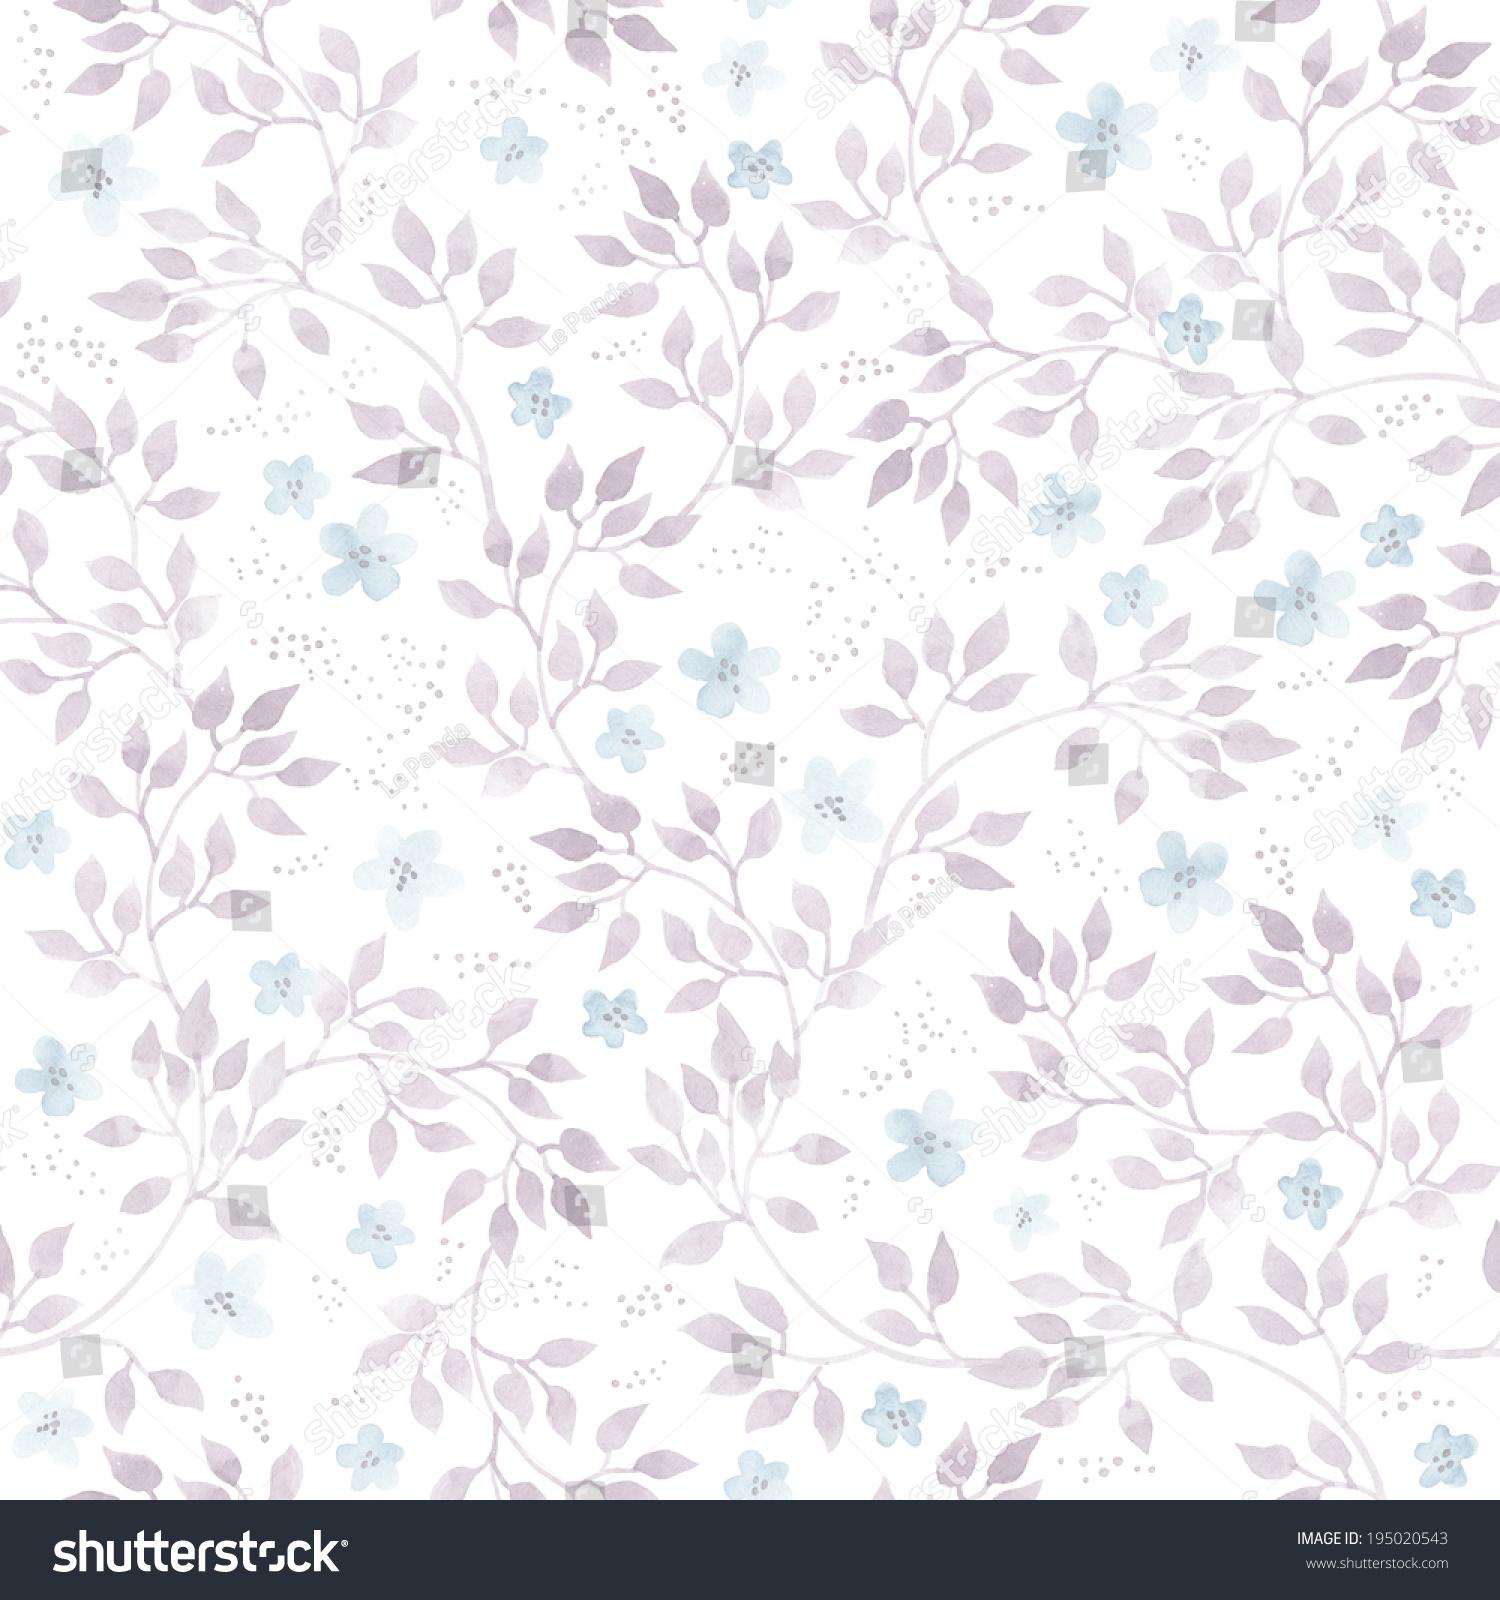 Royalty Free Floral Background Design Subtle Stock Images Photos